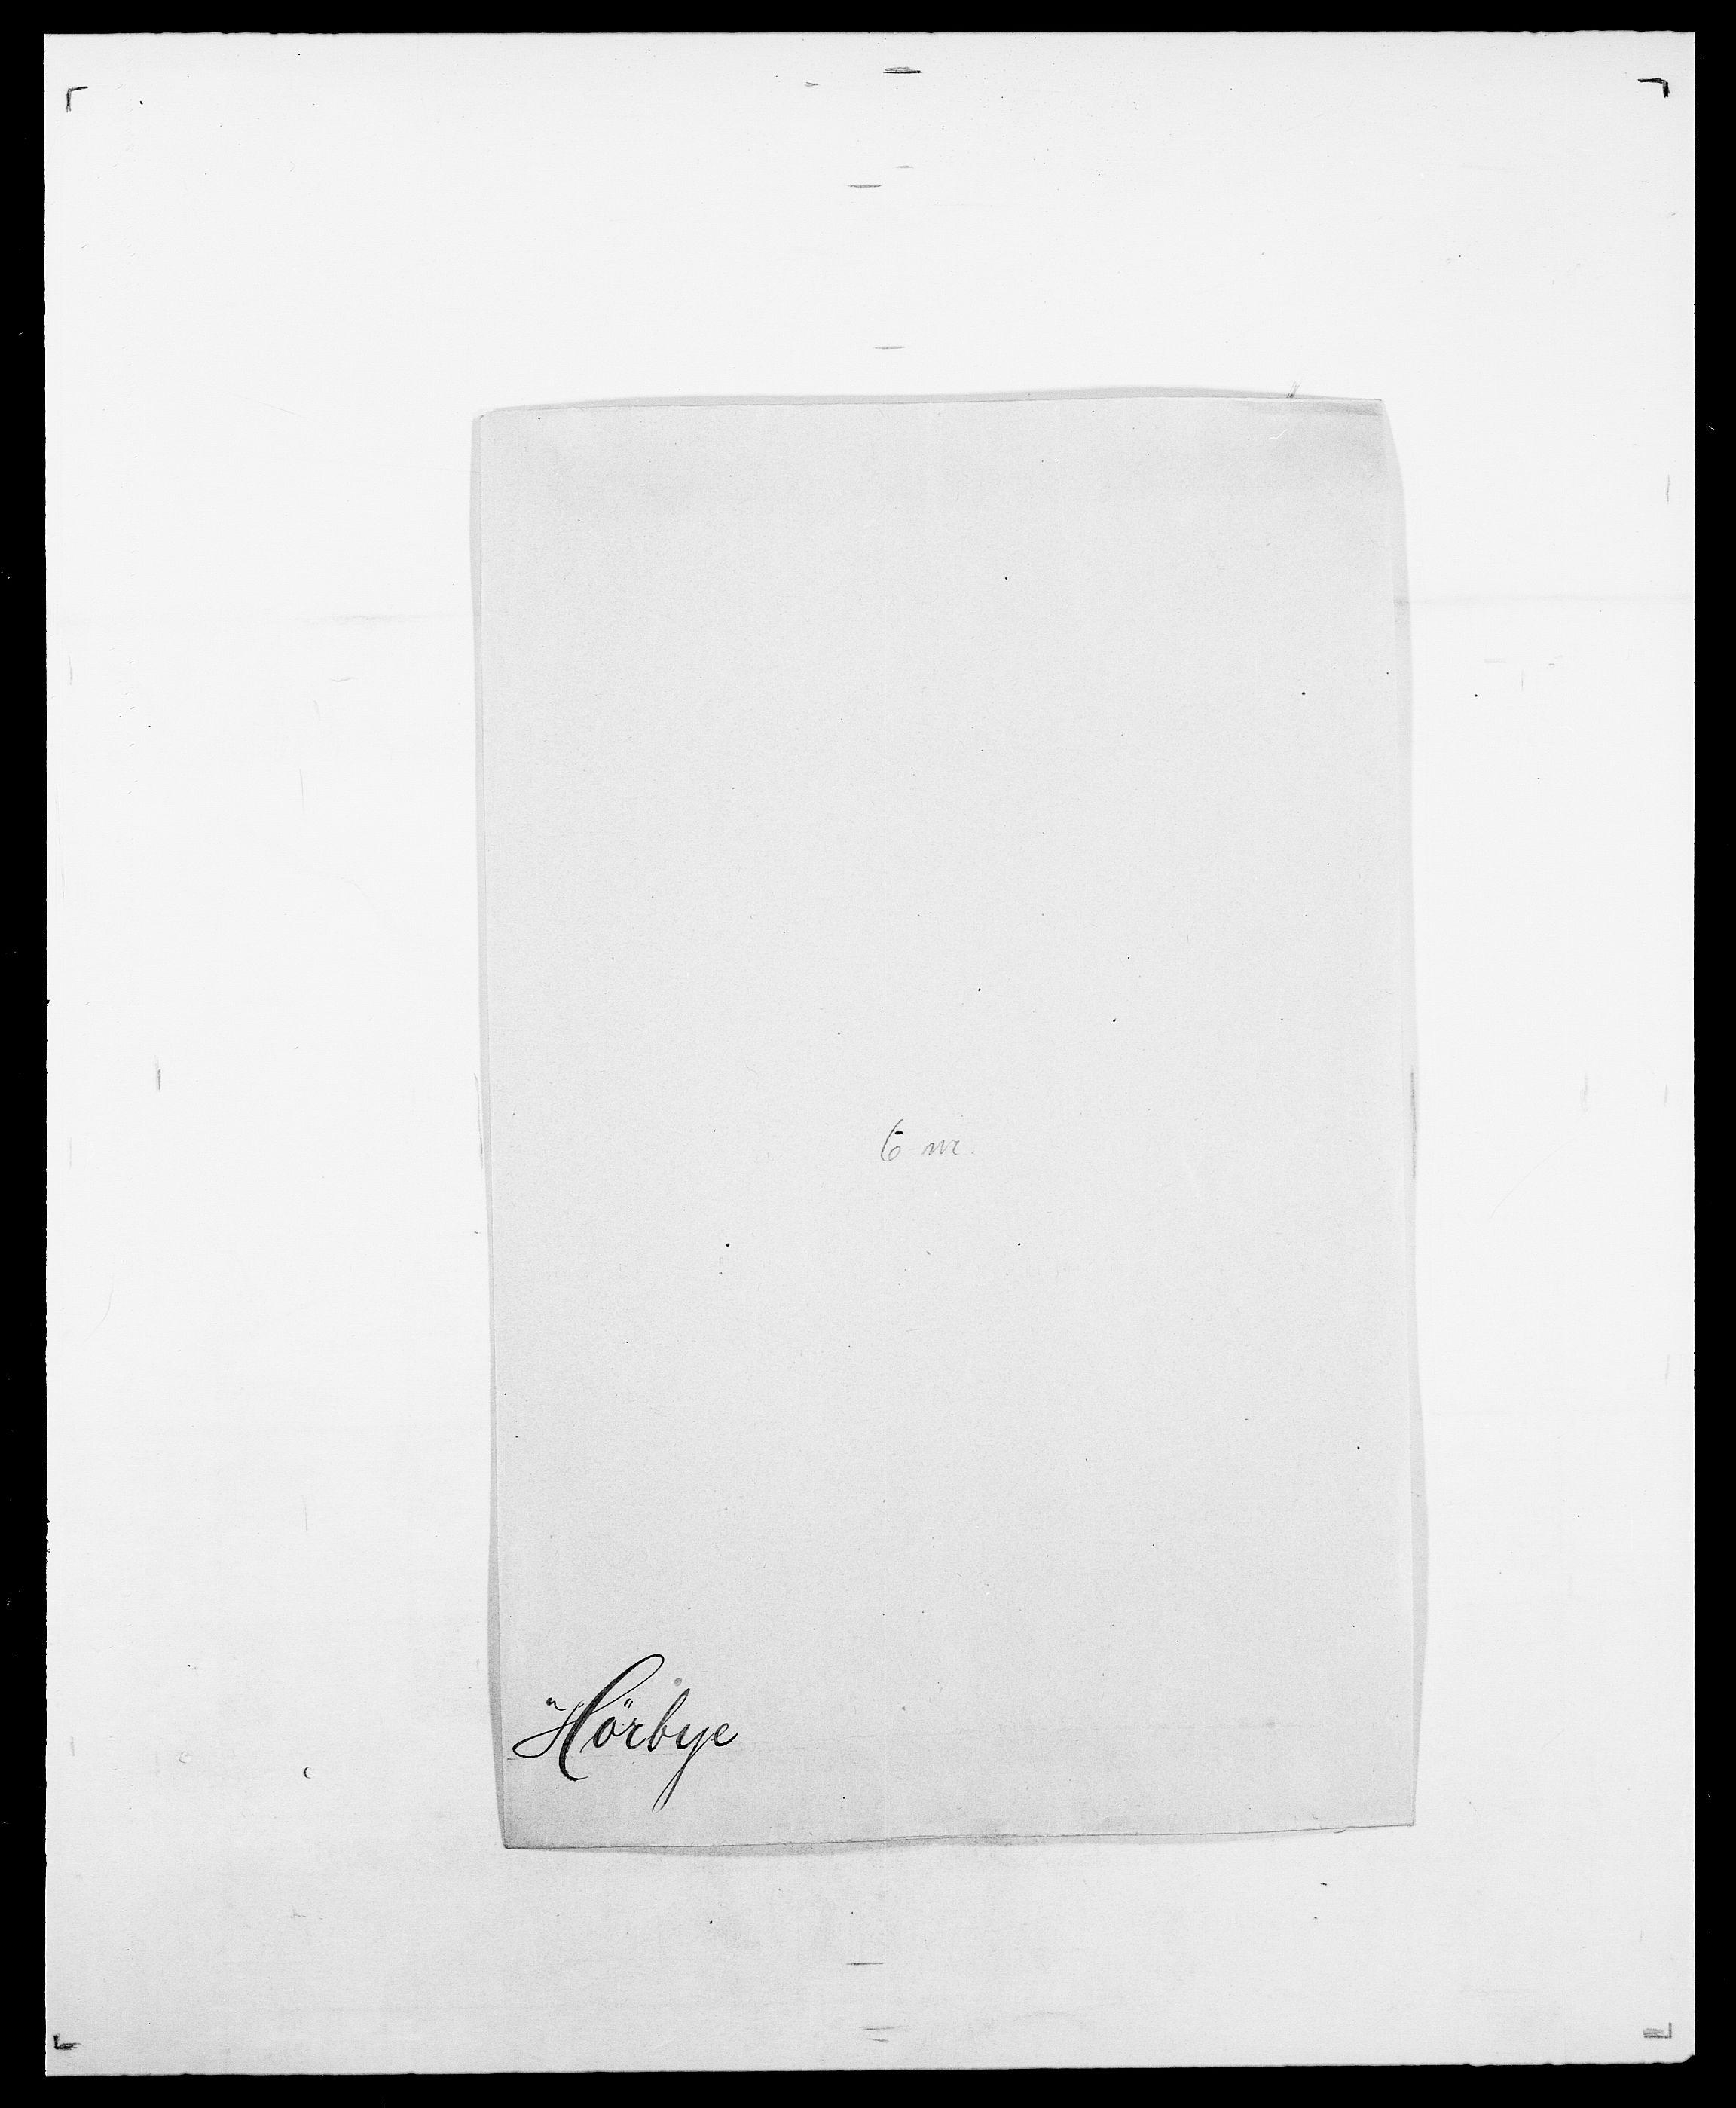 SAO, Delgobe, Charles Antoine - samling, D/Da/L0019: van der Hude - Joys, s. 373